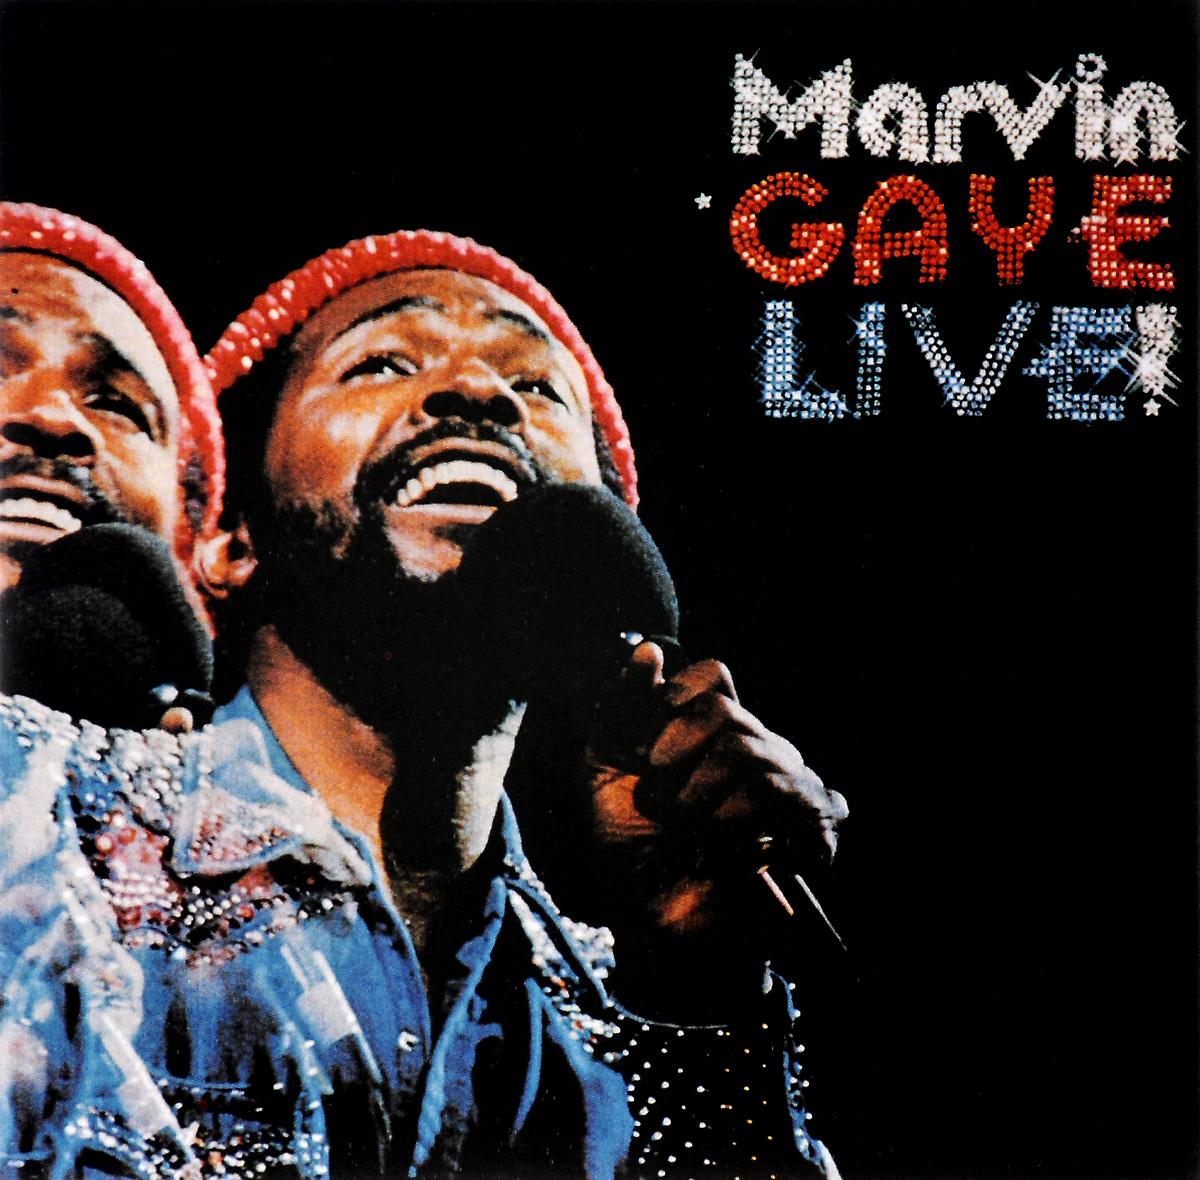 Марвин Гэй Marvin Gaye. Live марвин гэй marvin gaye volume jne 1961 1965 7 lp